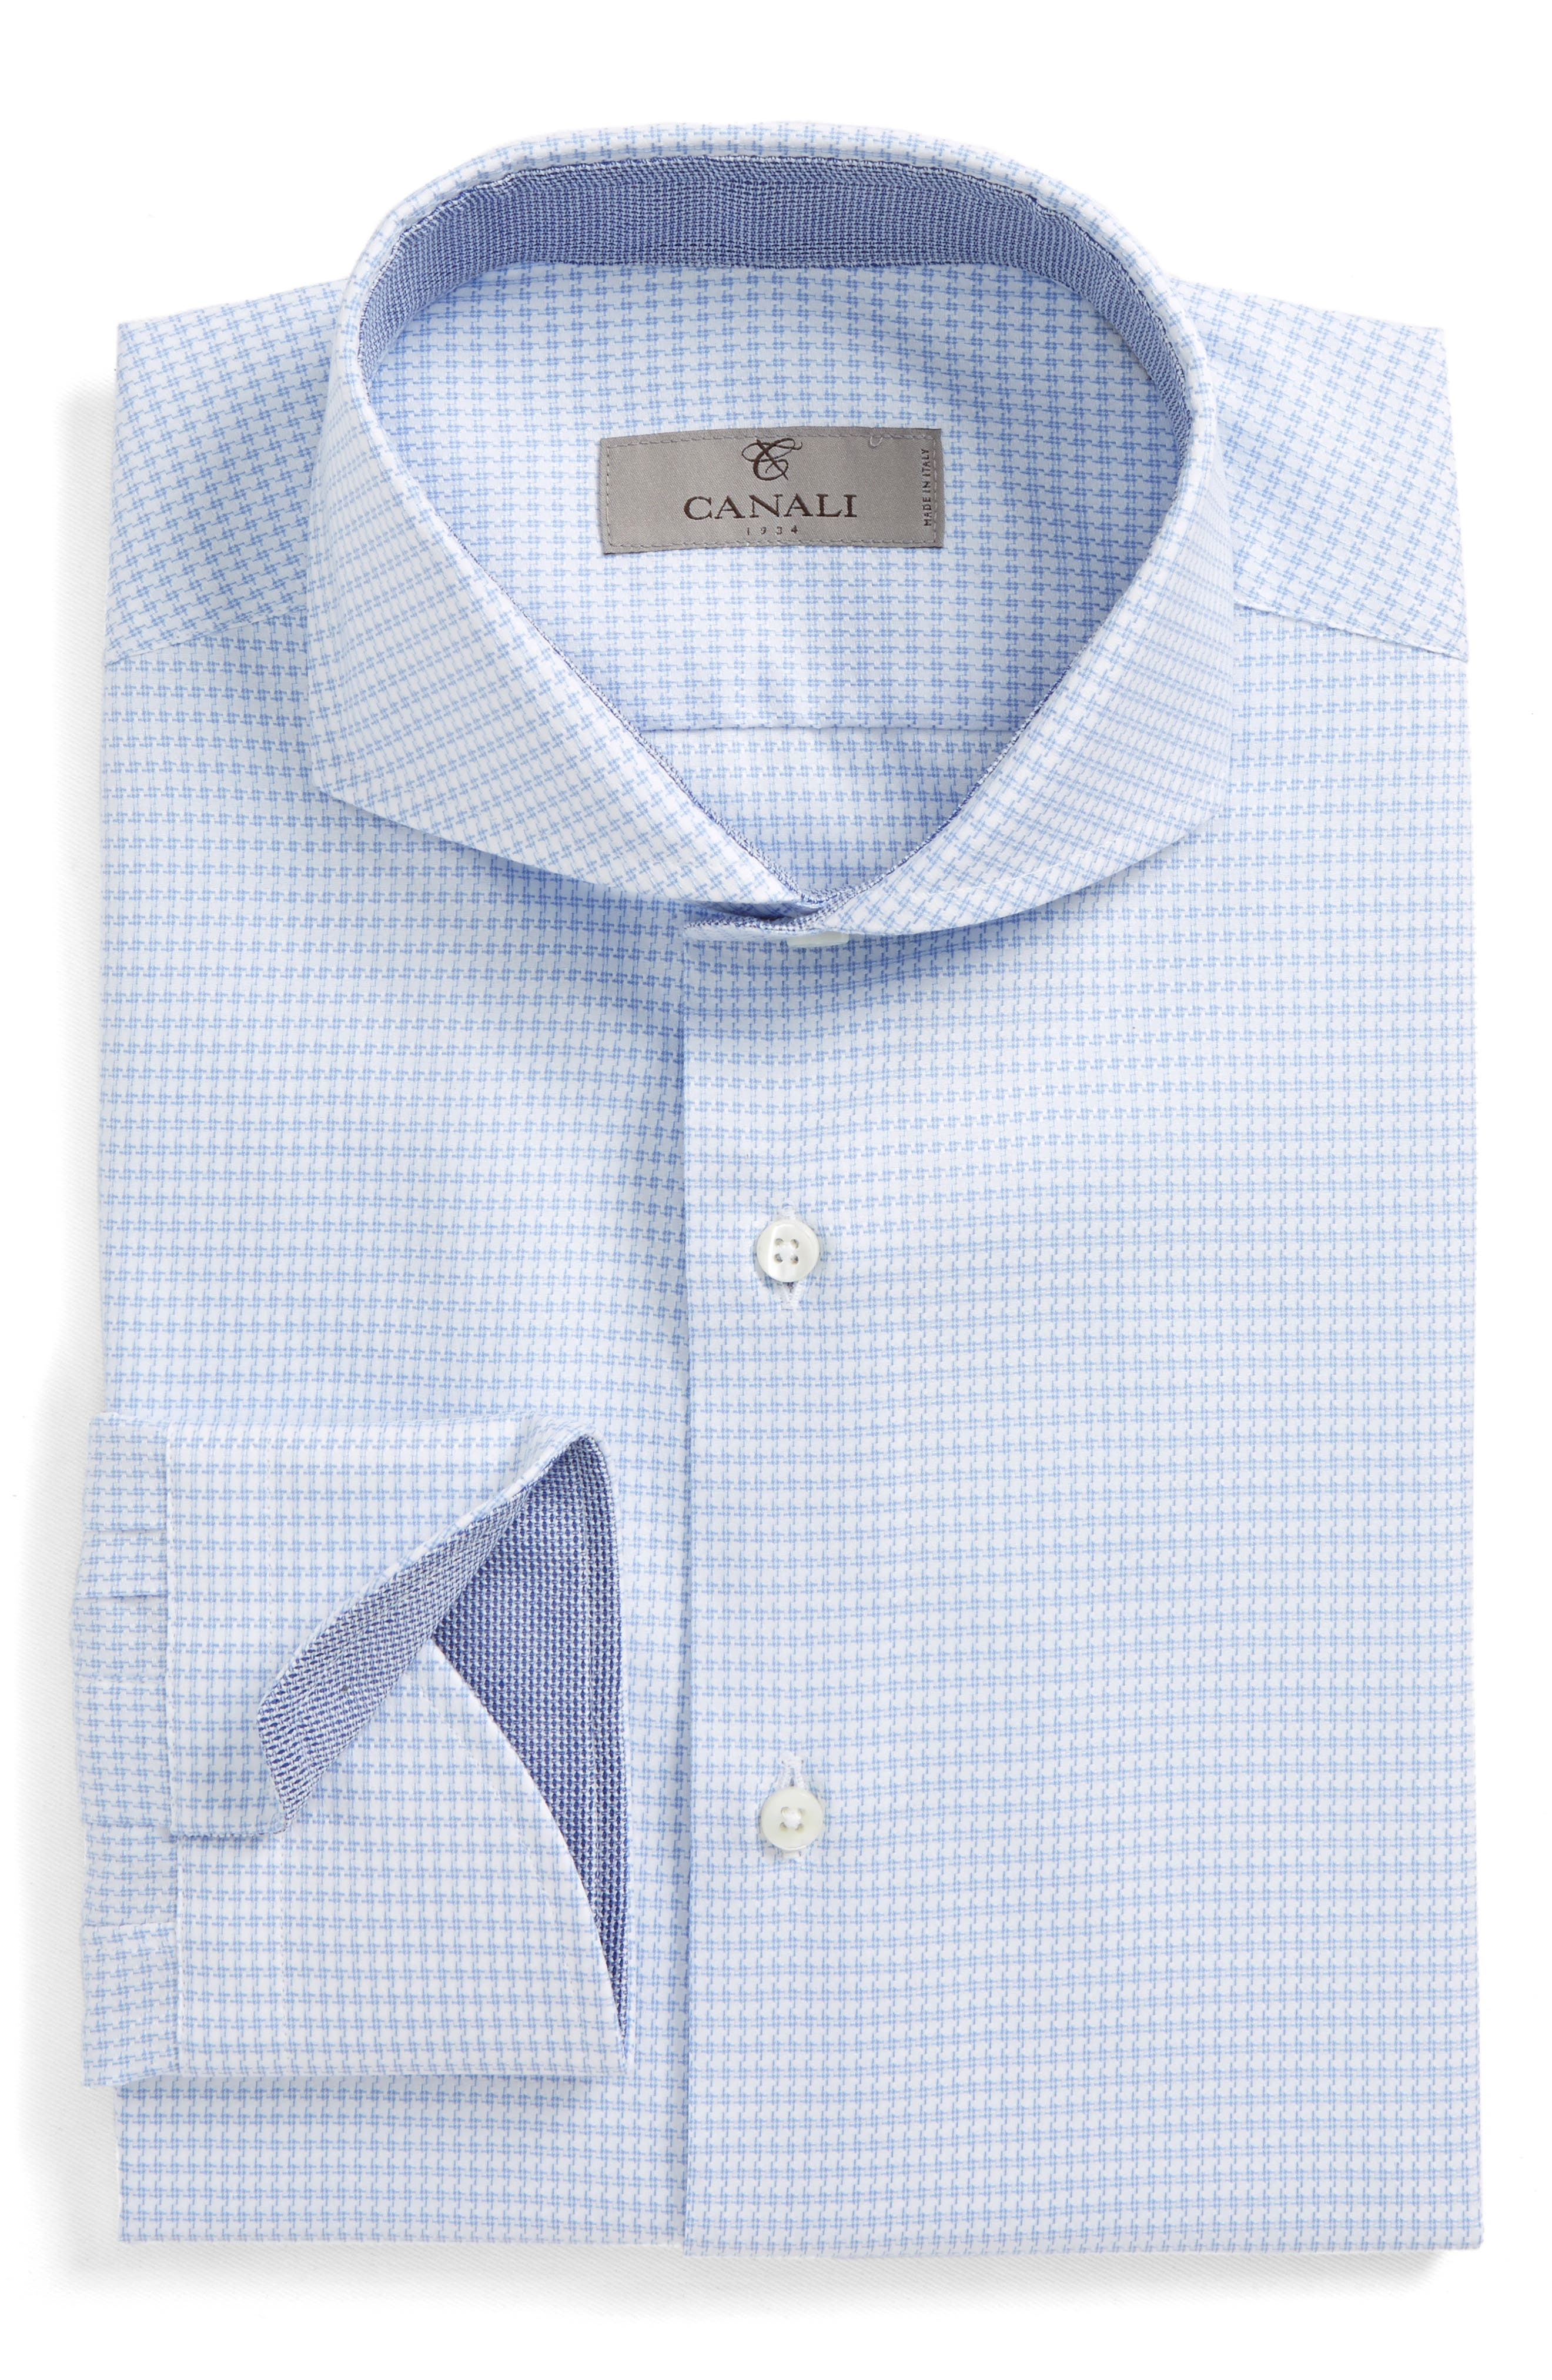 Regular Fit Houndstooth Dress Shirt,                         Main,                         color, Light Blue